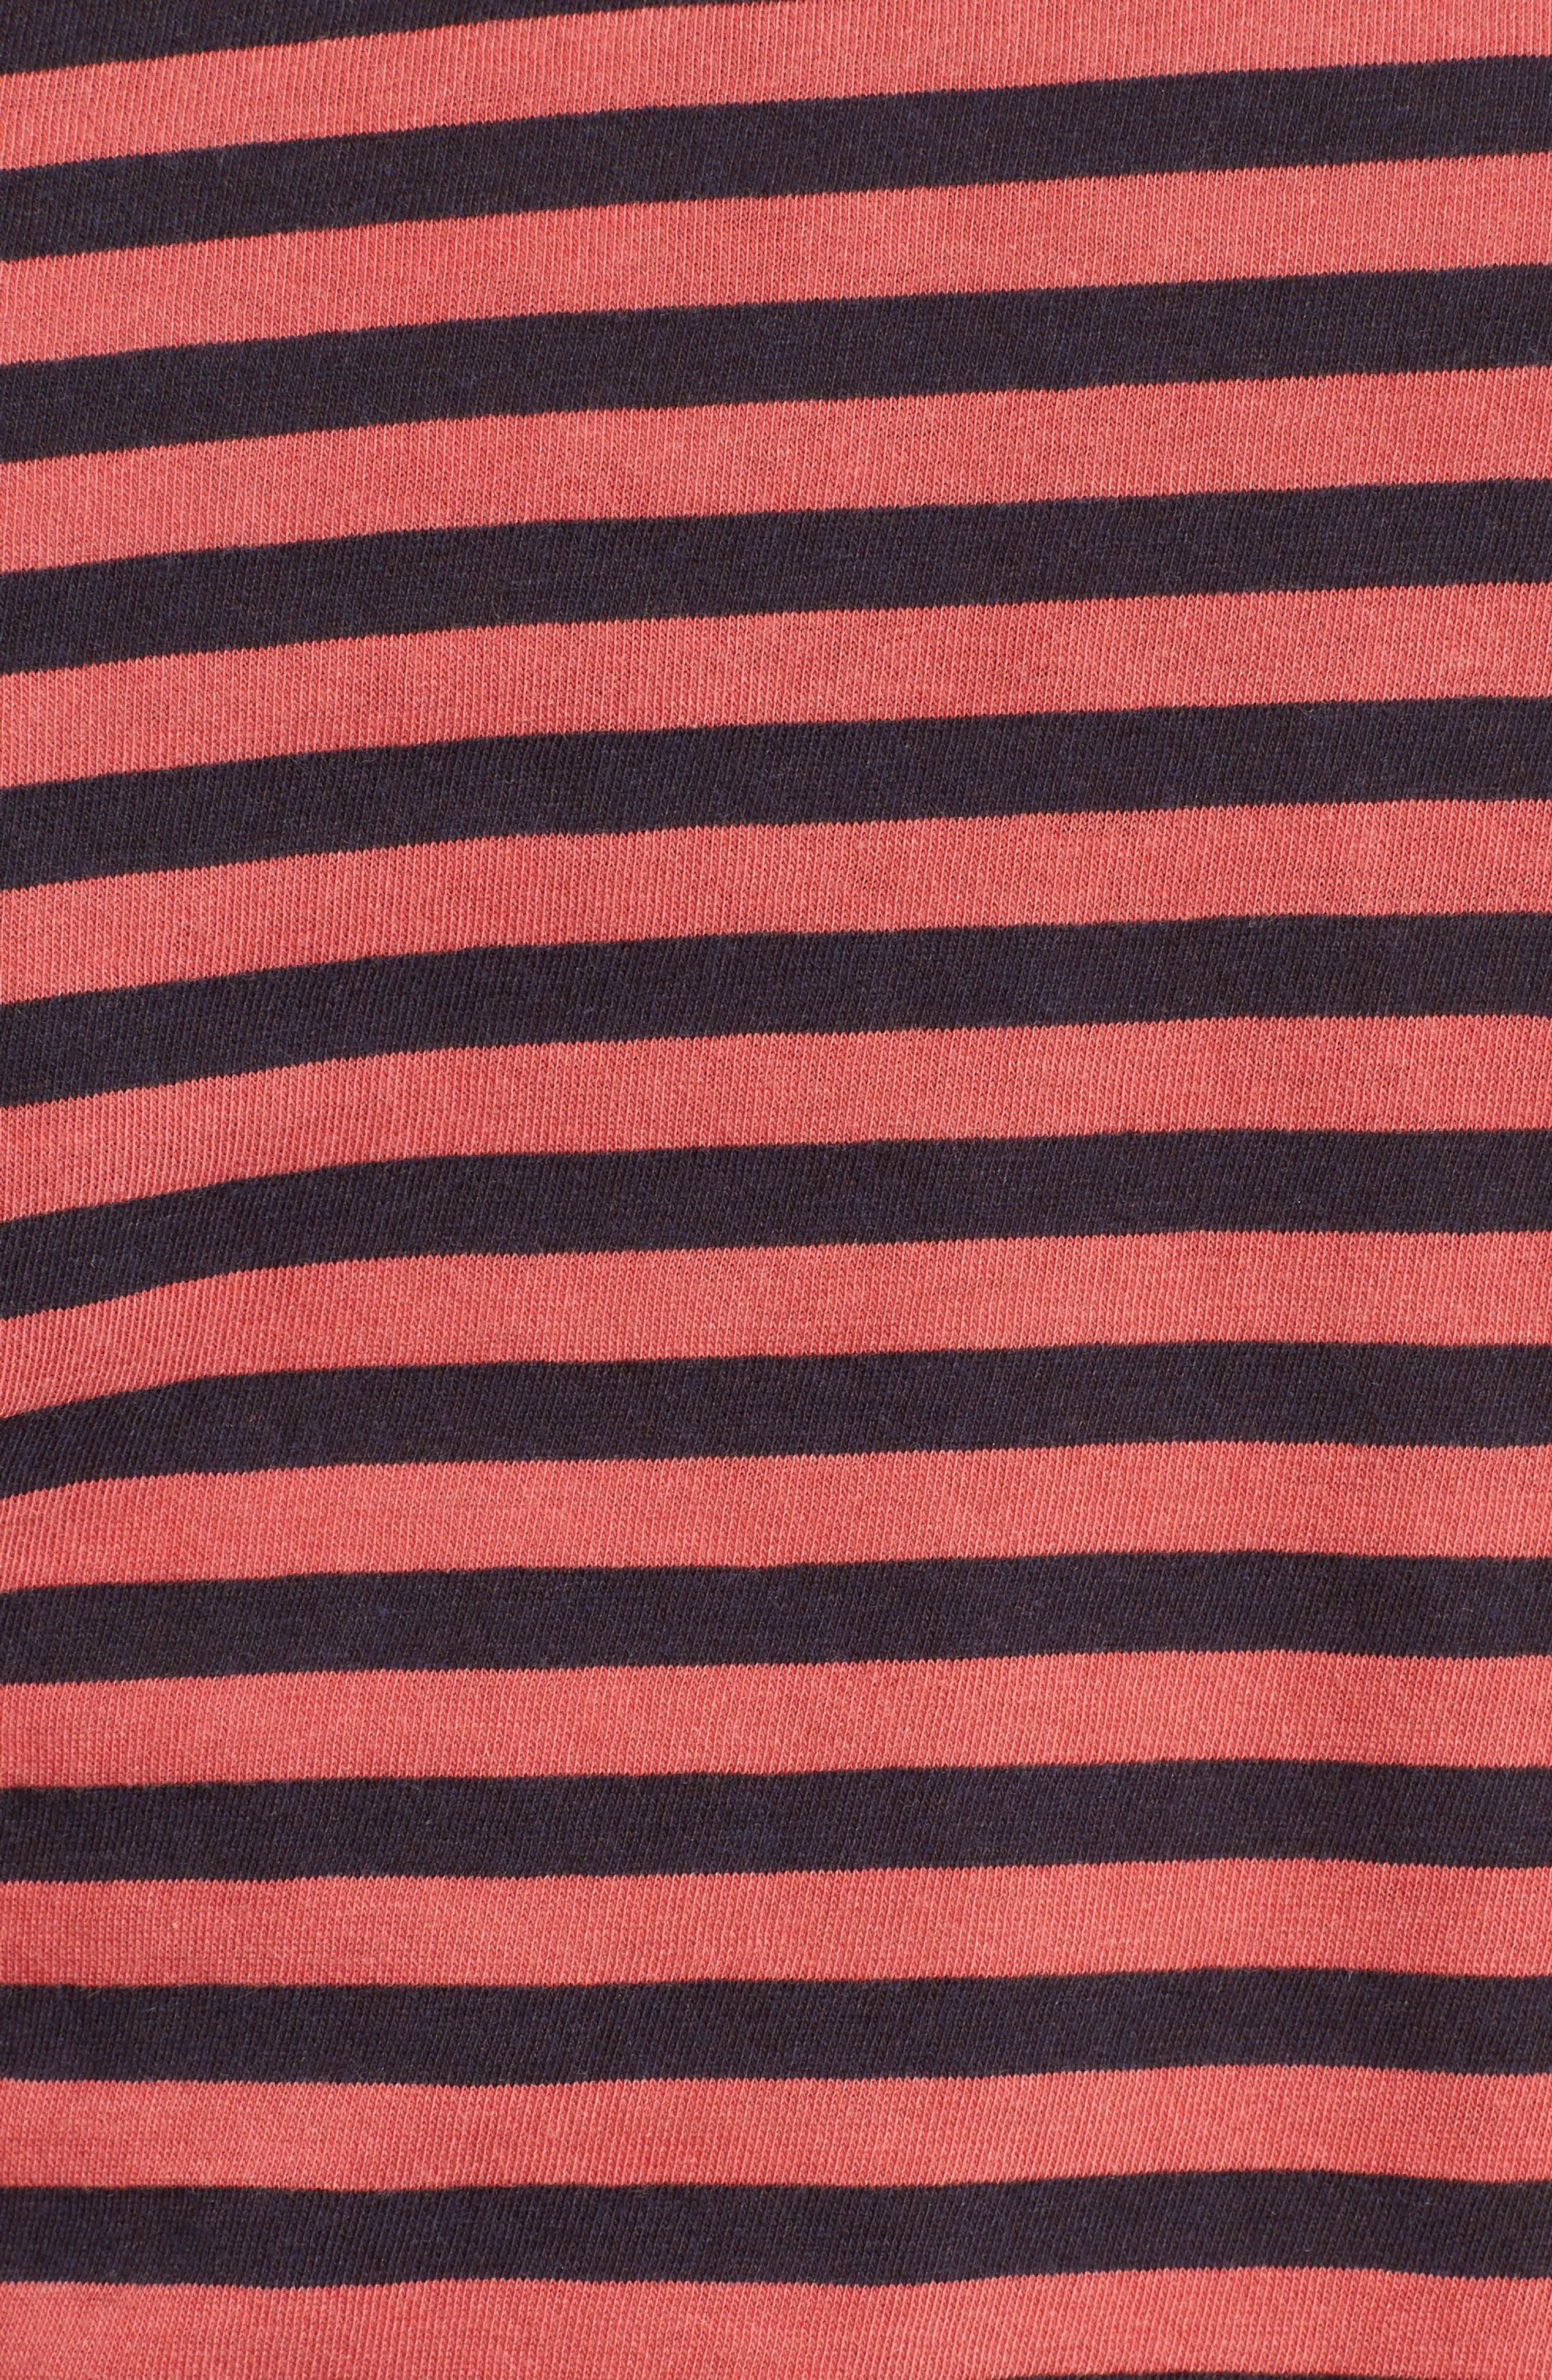 Stripe Cotton Boy Tee,                             Alternate thumbnail 5, color,                             Chili